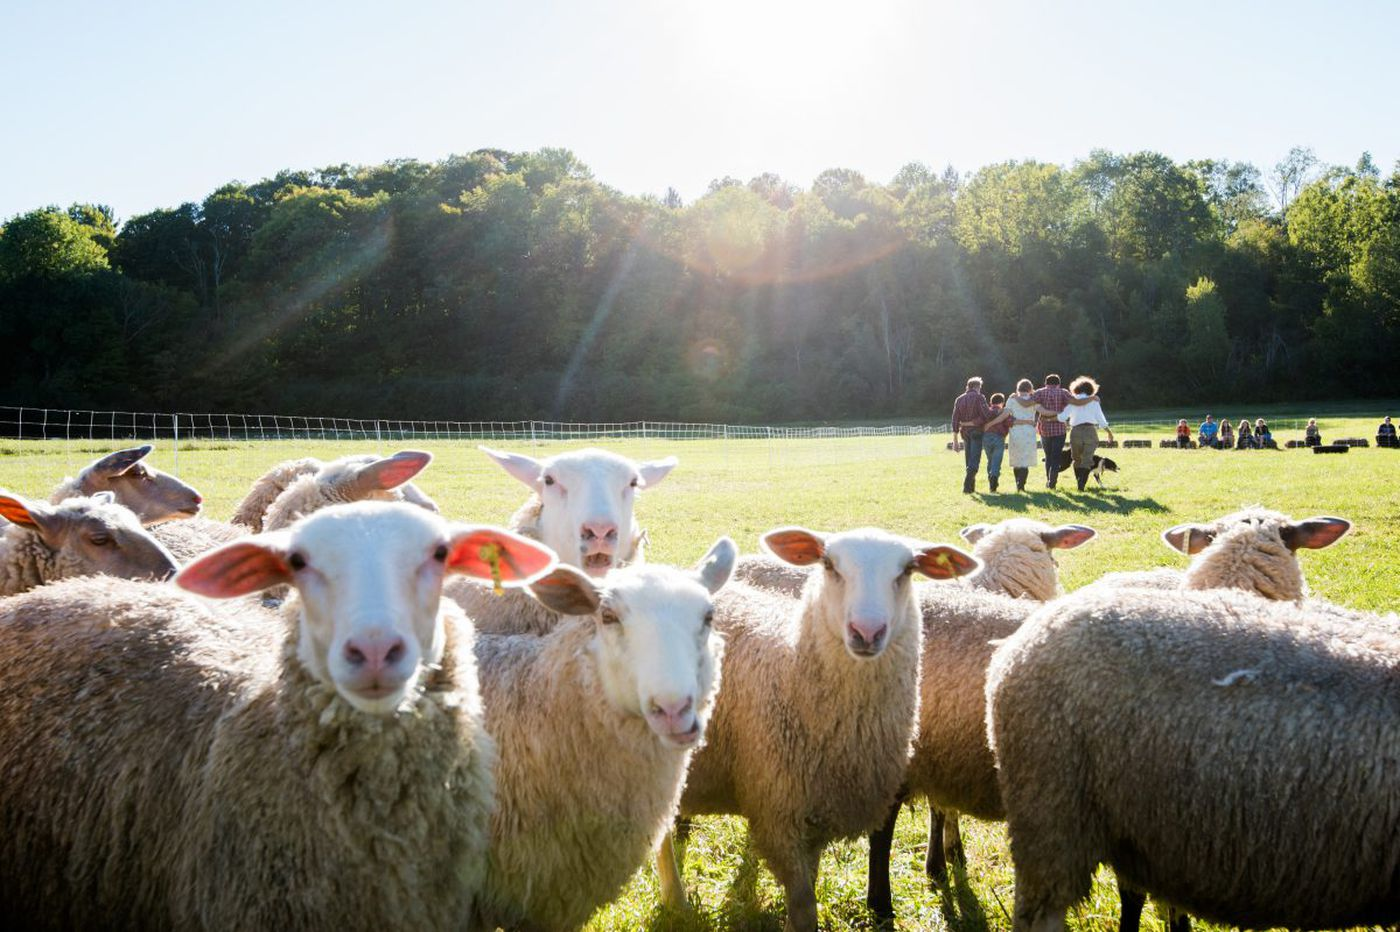 Kimmel Center's PIFA fest returns with human chandelier, global 'genius' artists, dancing sheep